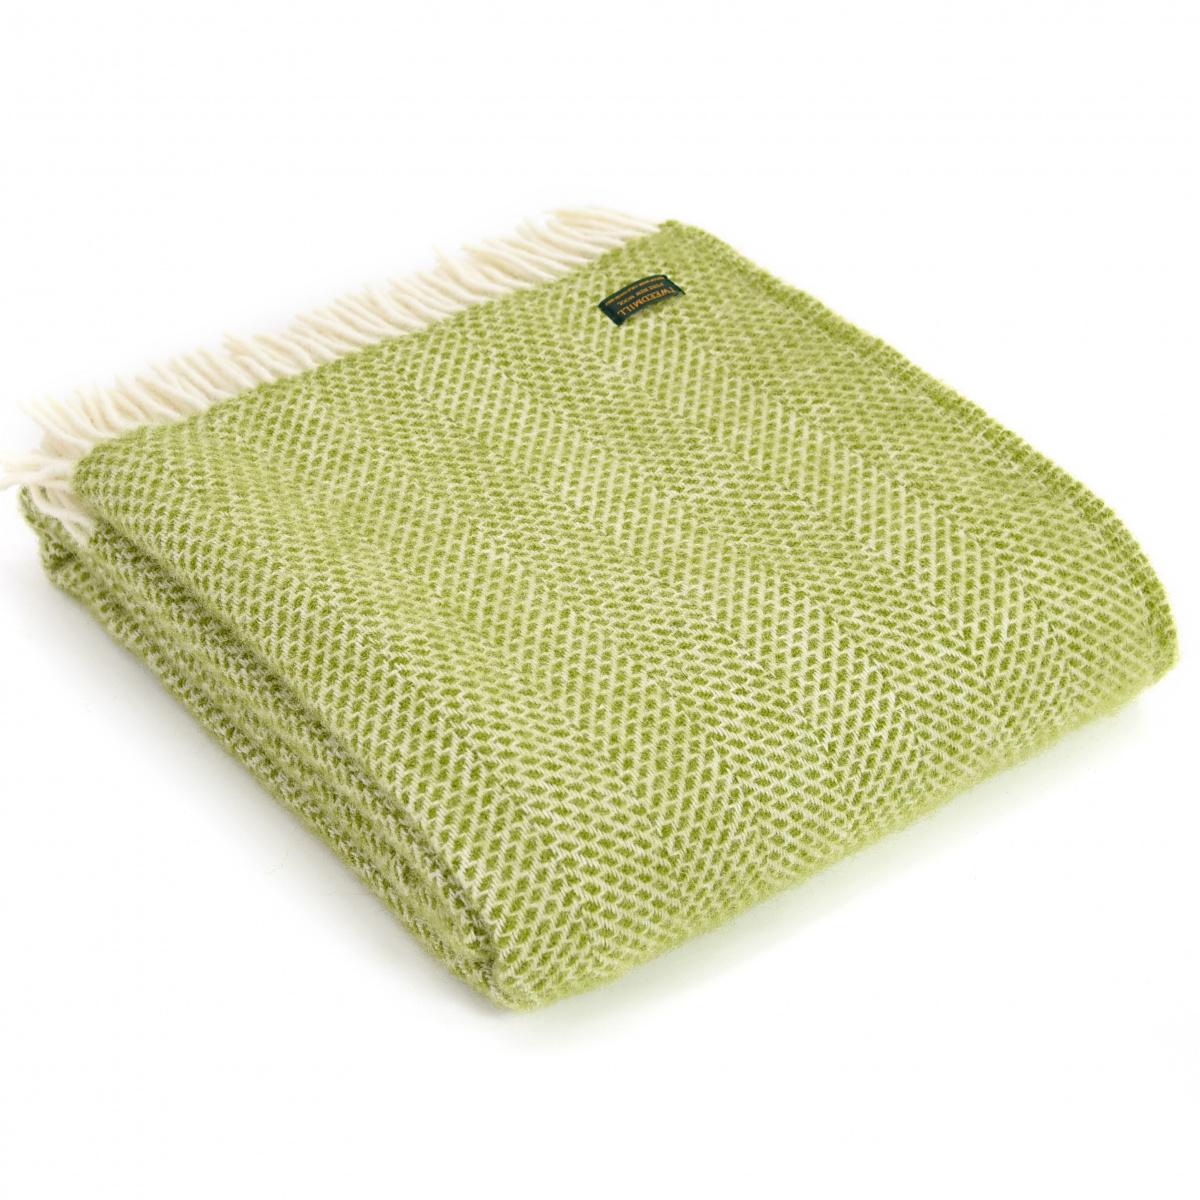 Tweedmill uldplaid - Beehive Kiwi